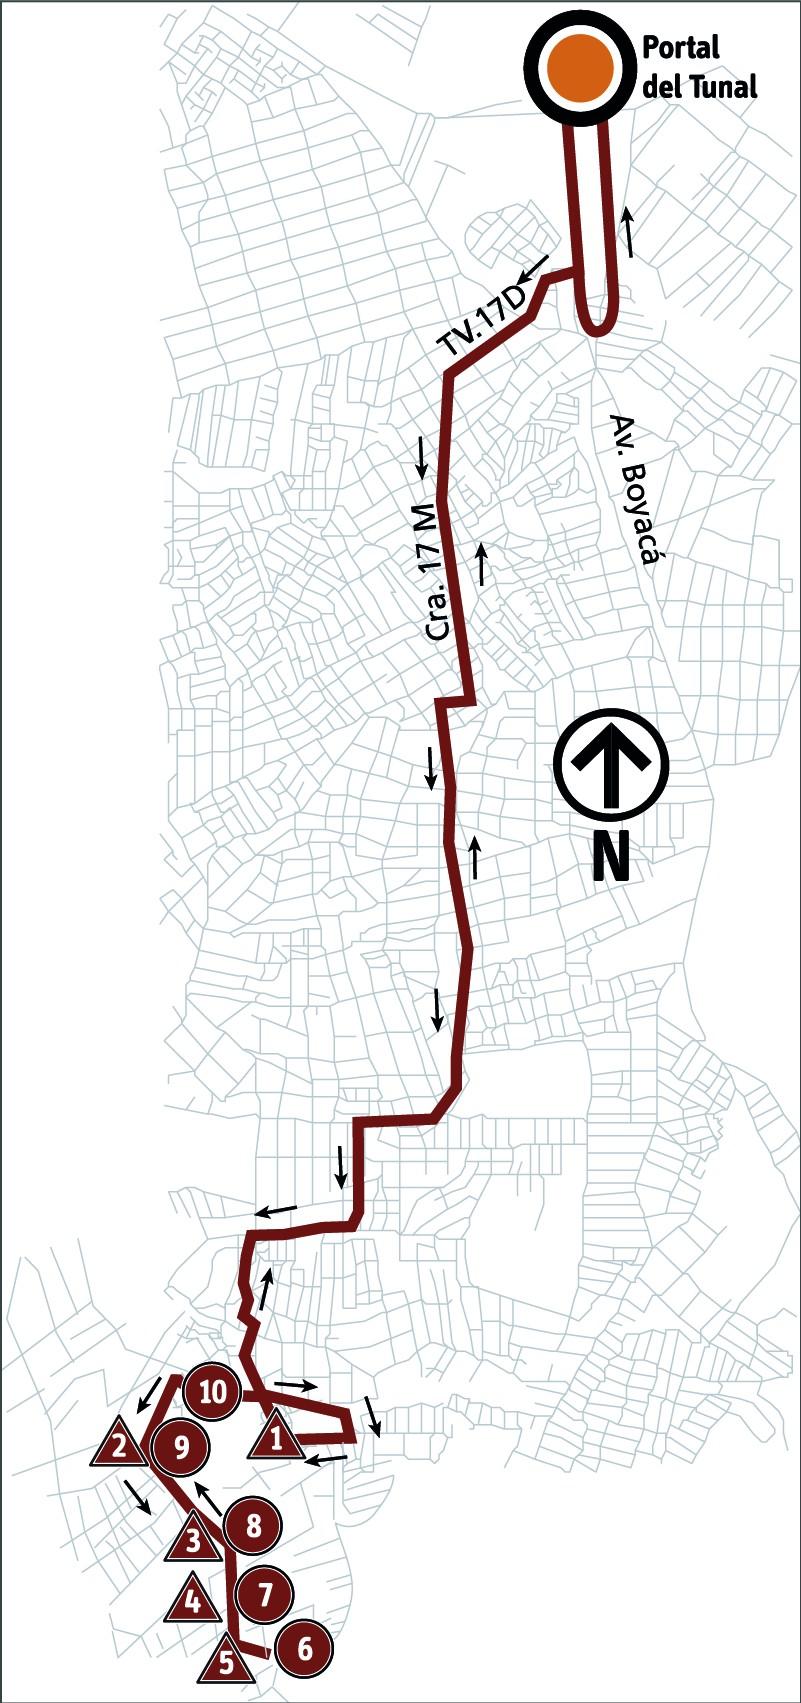 Ruta SITP: 6-5C ➜ Ampliación Arabia [Alimentador]